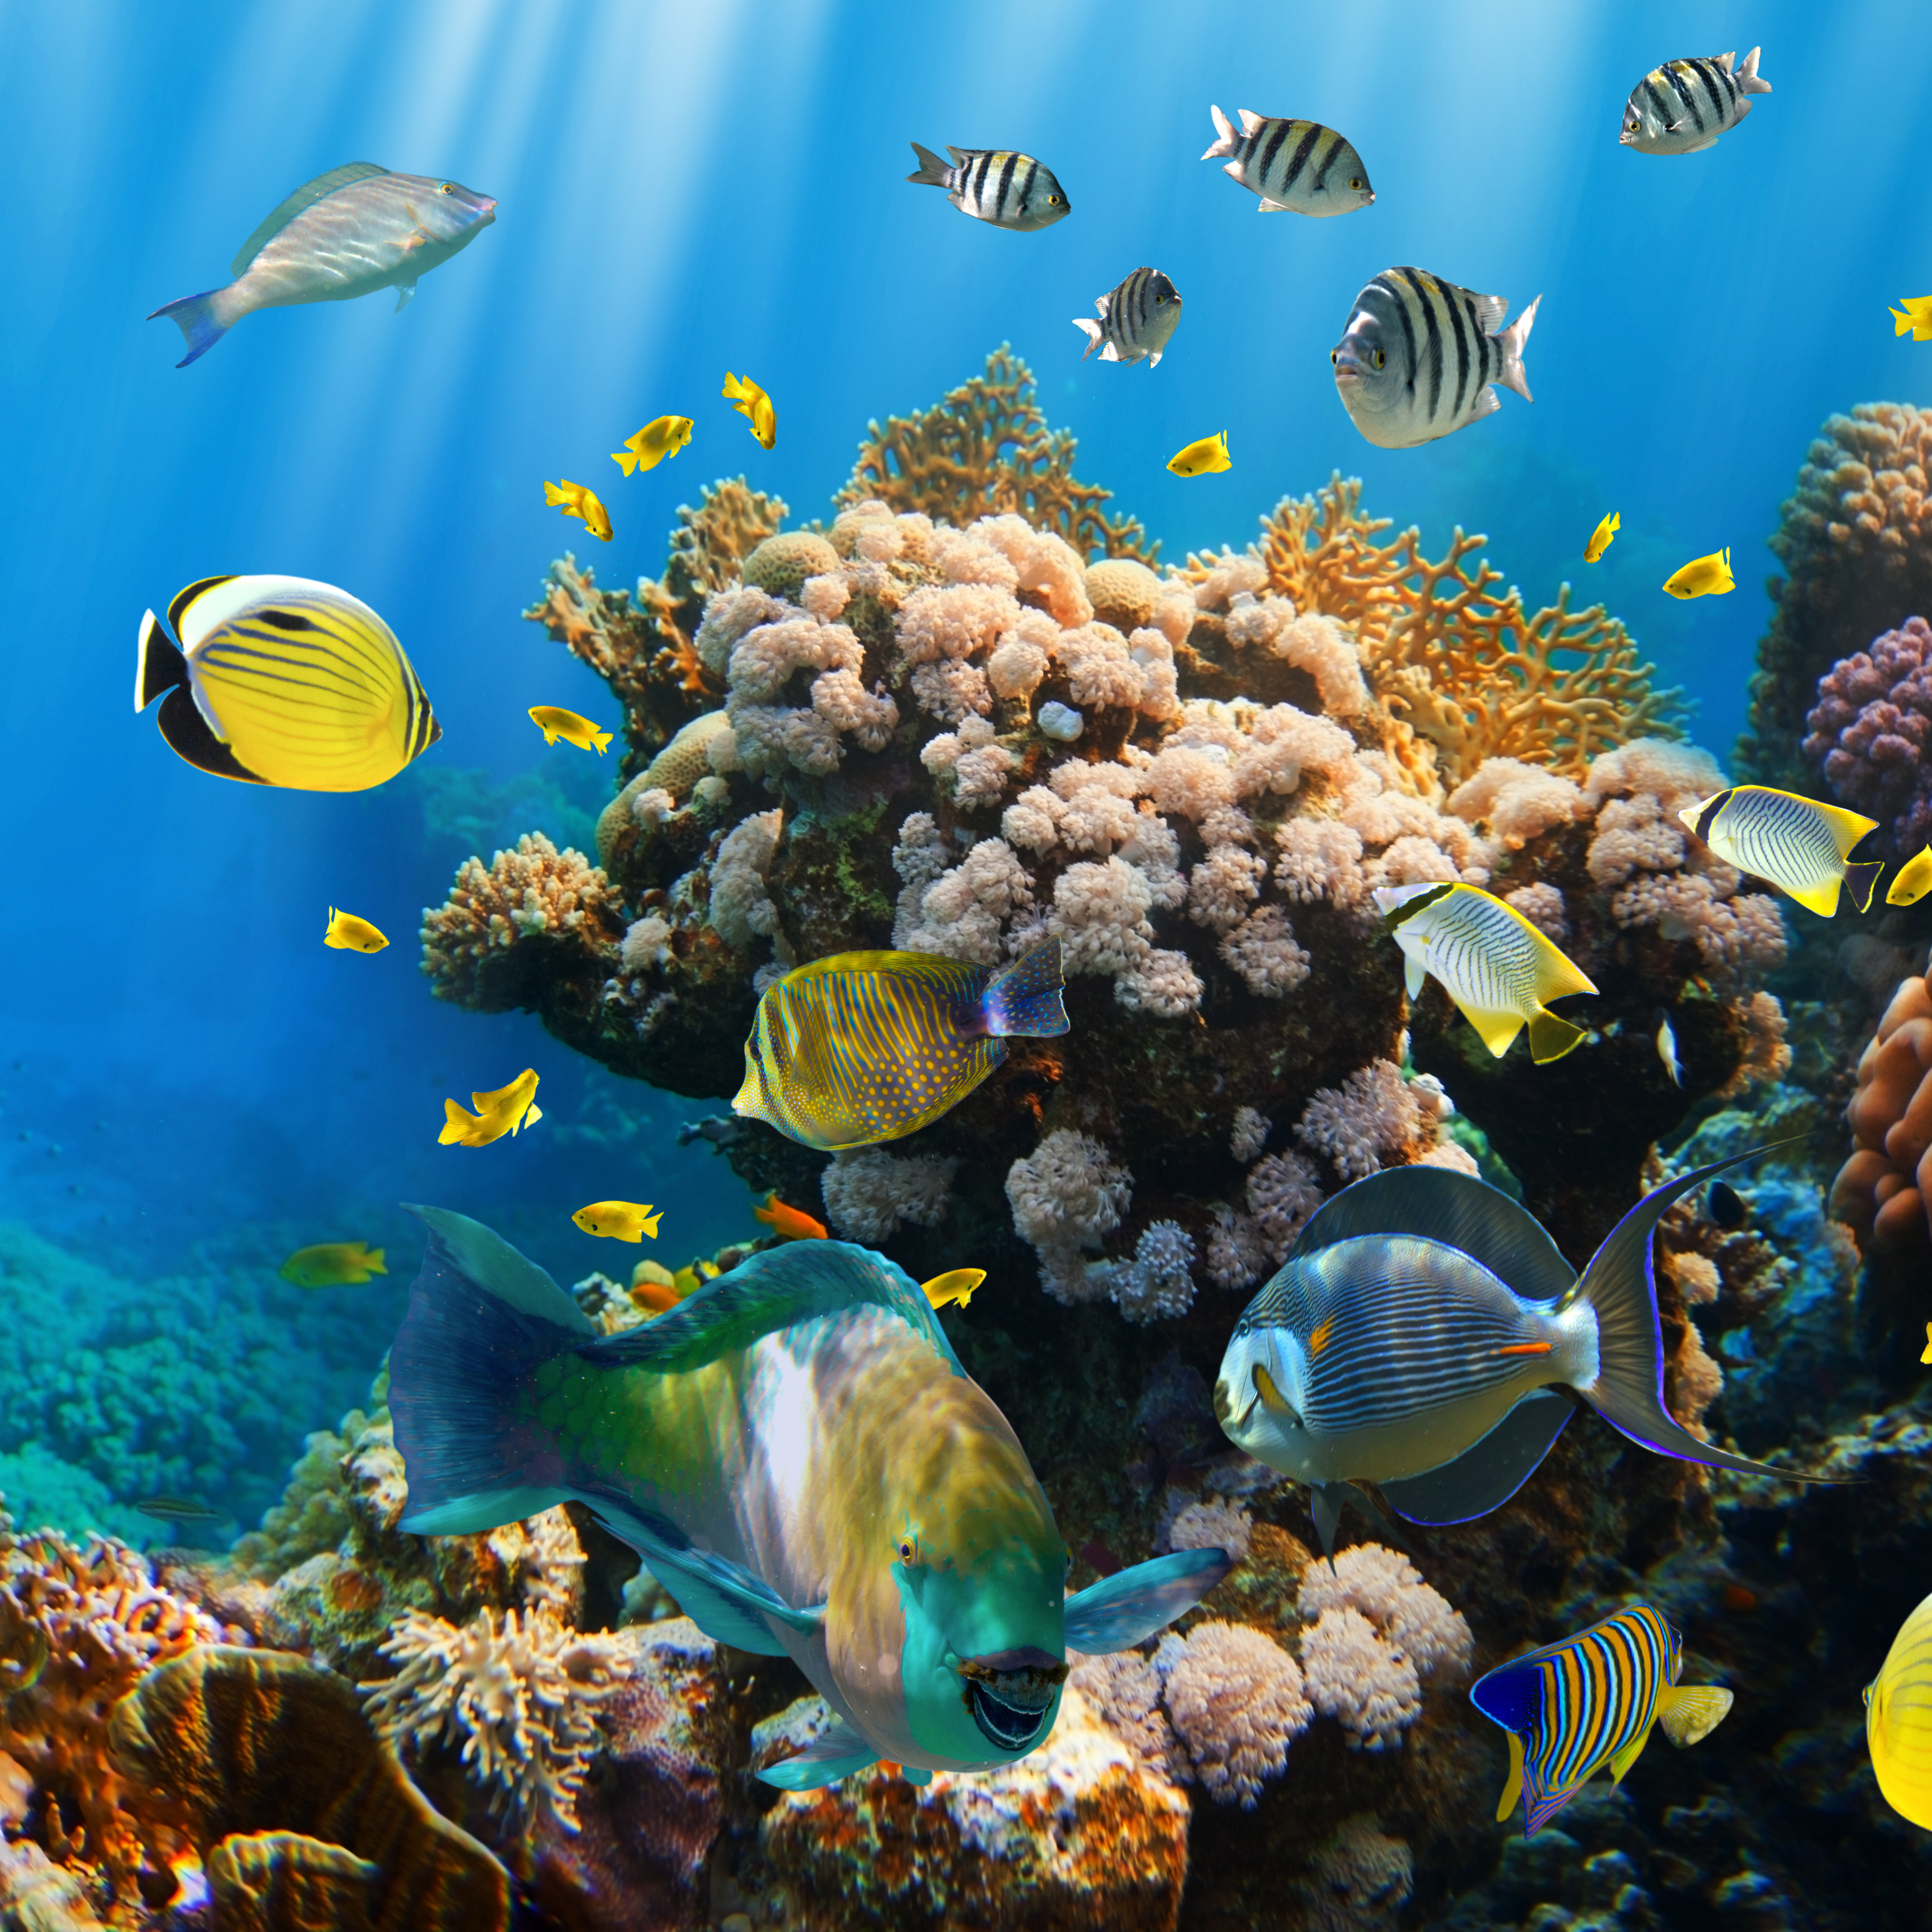 Coral Reef Background: Underwater Coral Reef Wallpaper